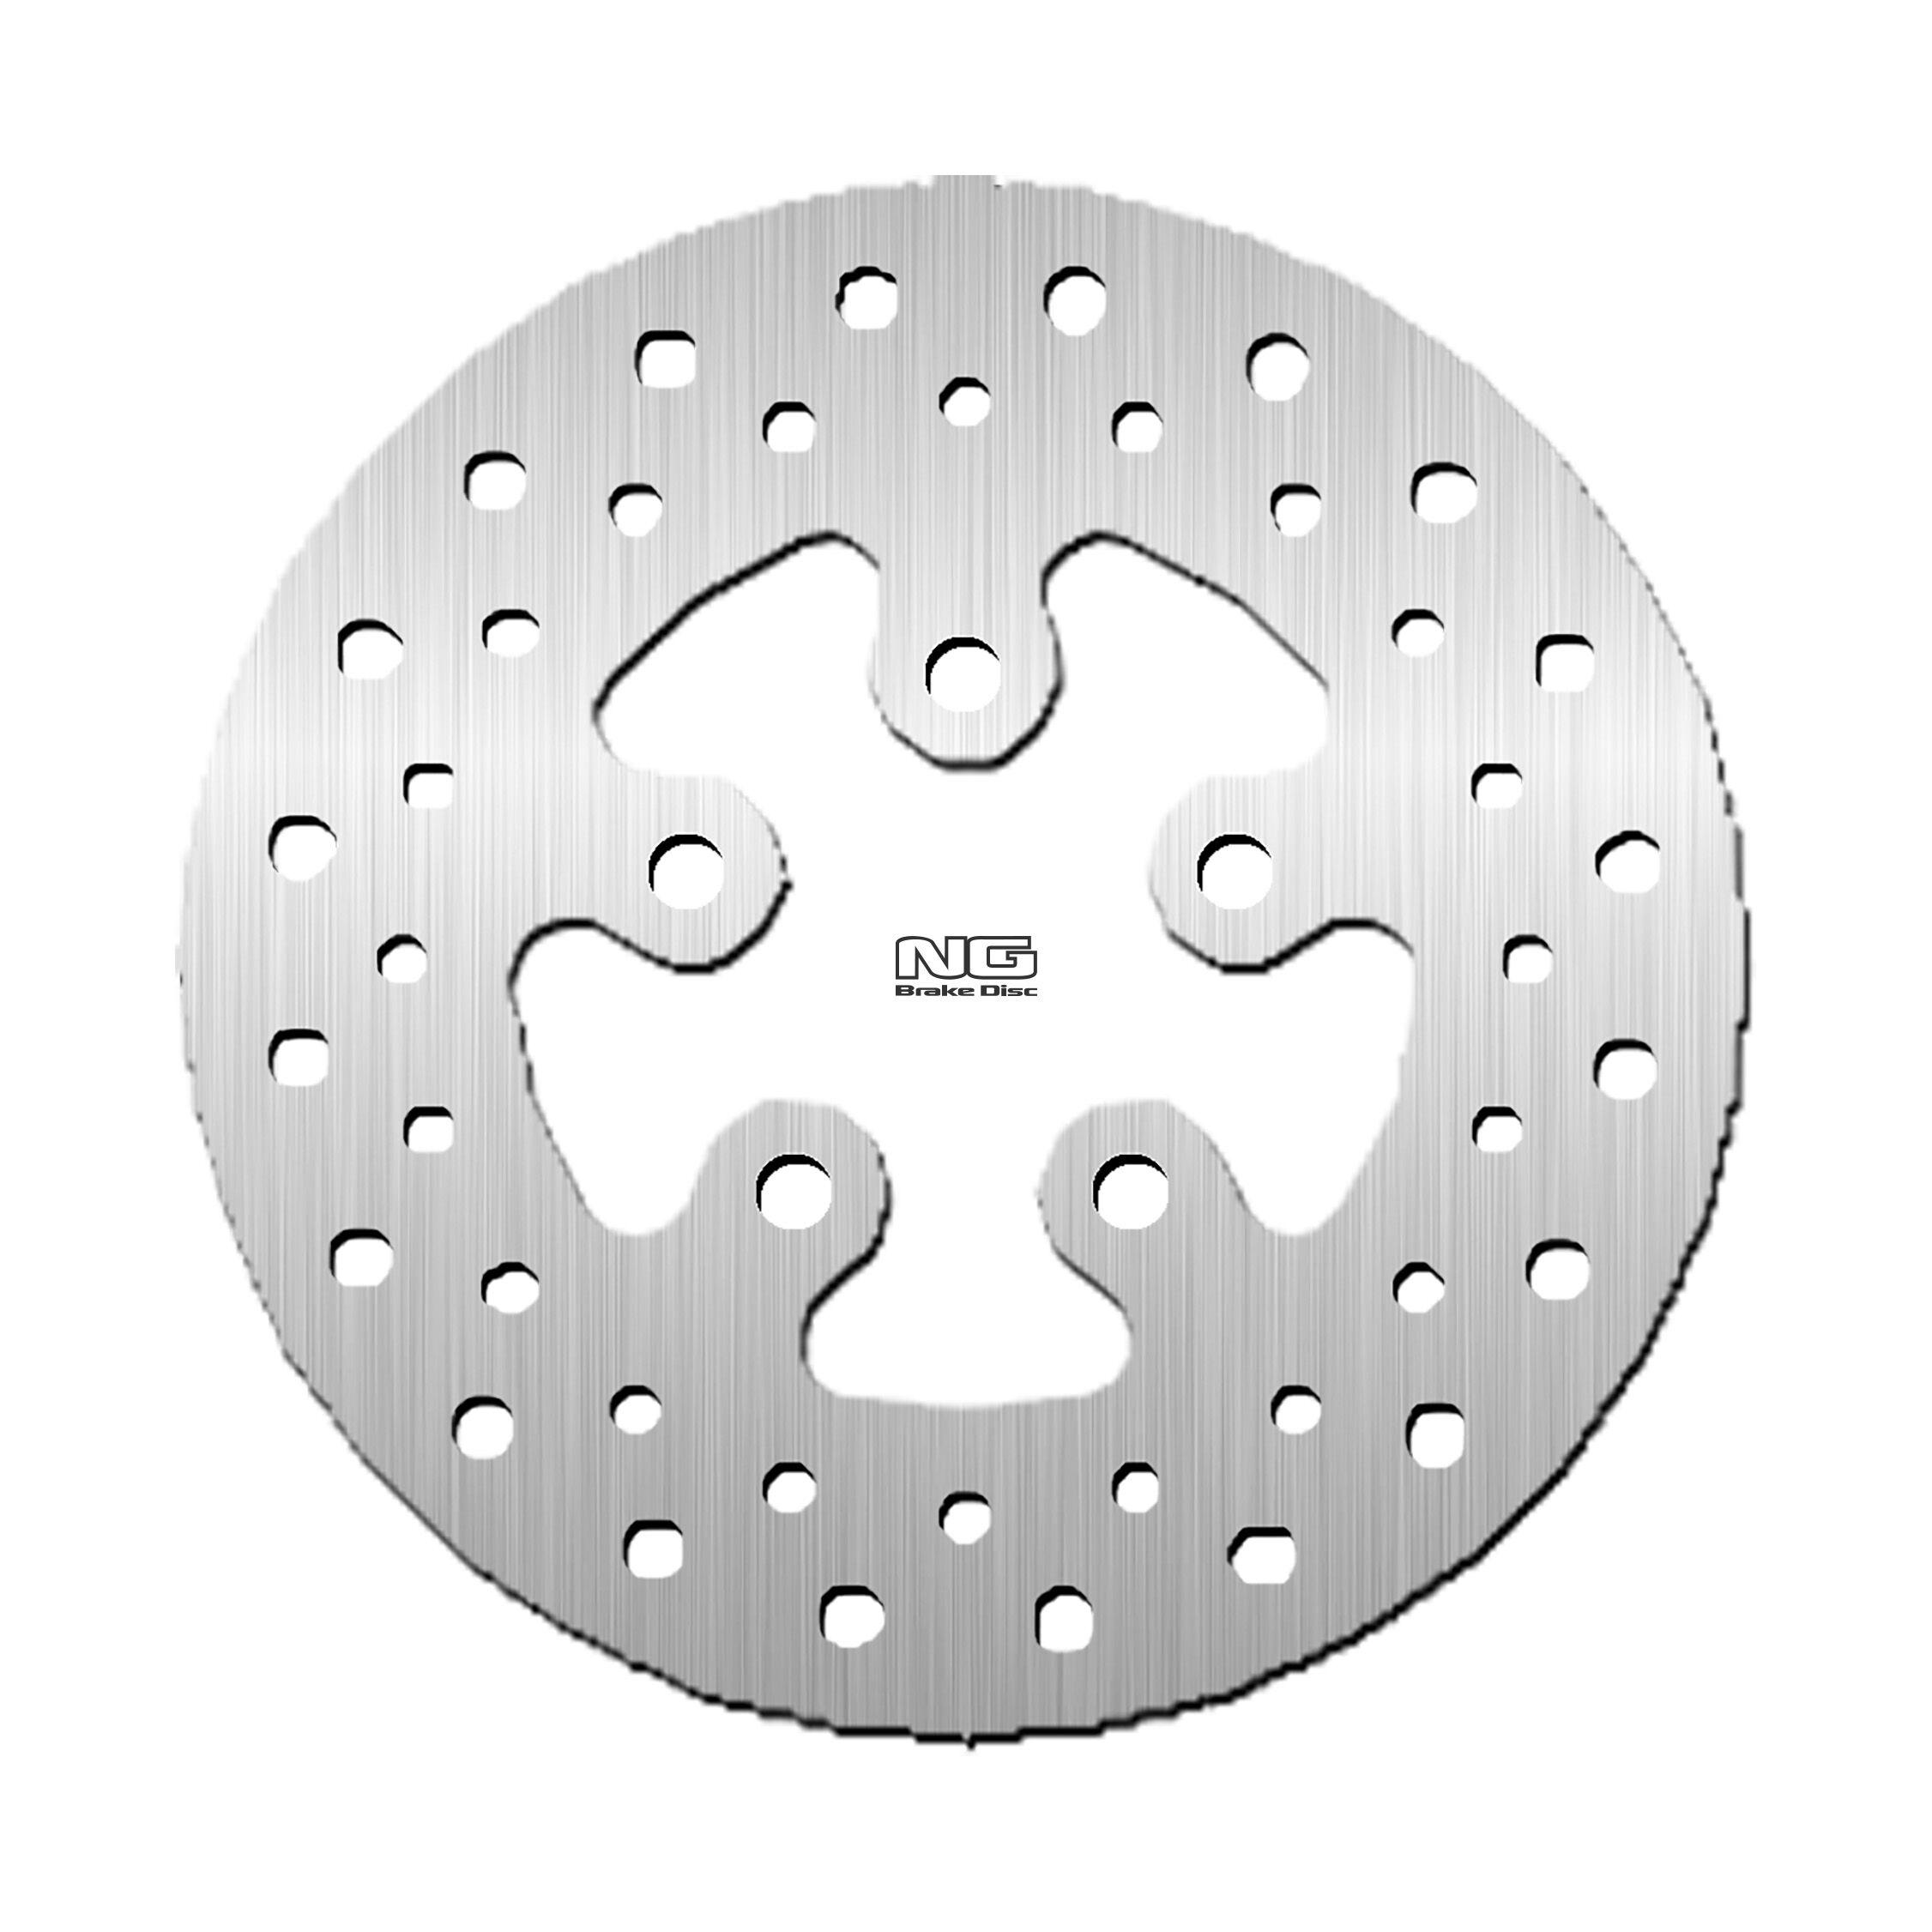 Obrázek produktu Brzdový kotouč NG Pravá - RINCON, TRX RINCON